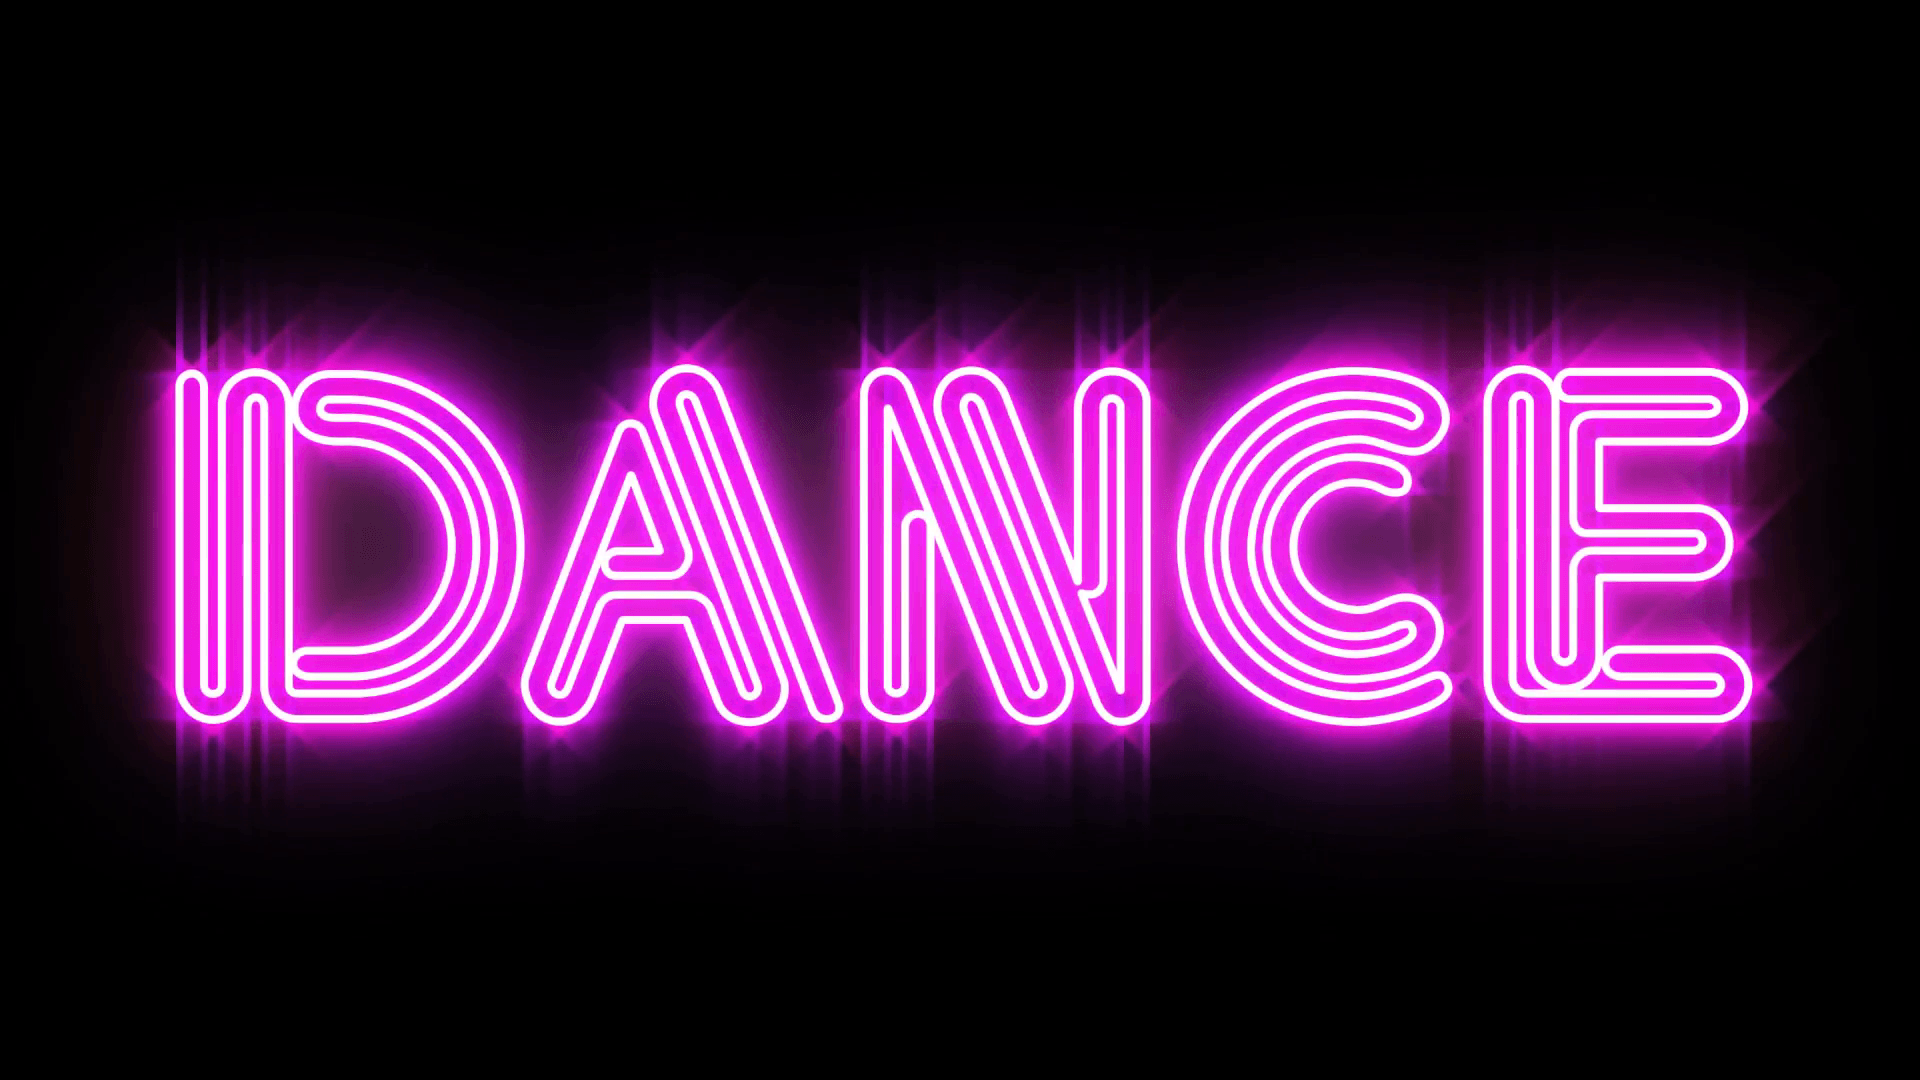 Pink Dance Wallpapers   Top Pink Dance Backgrounds 1920x1080